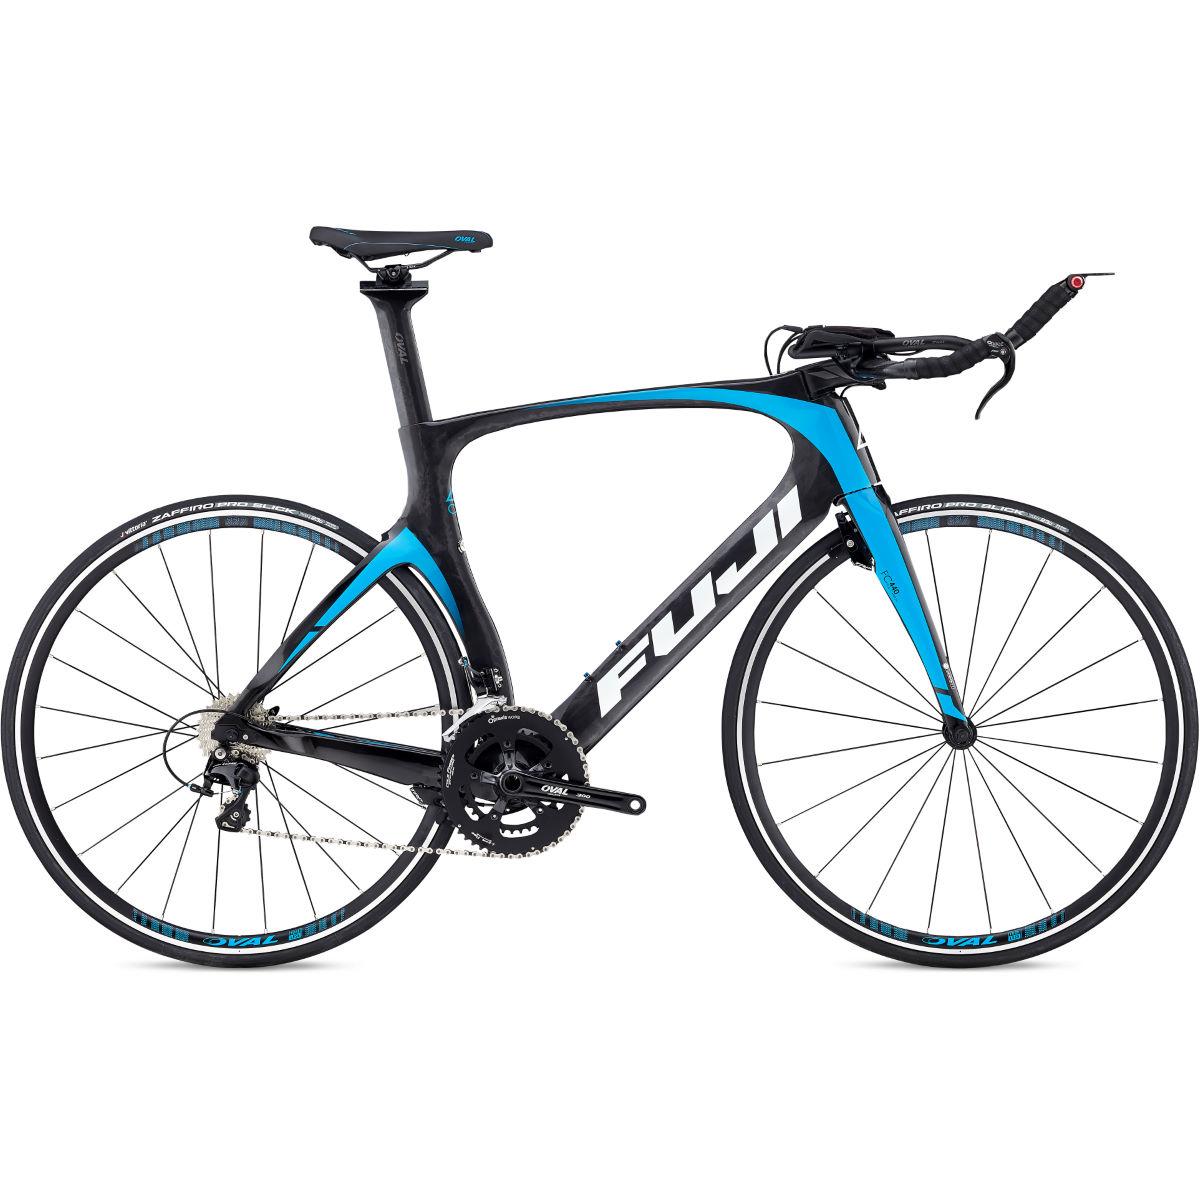 Fuji Norcom Straight 2.3 2018 Bikes